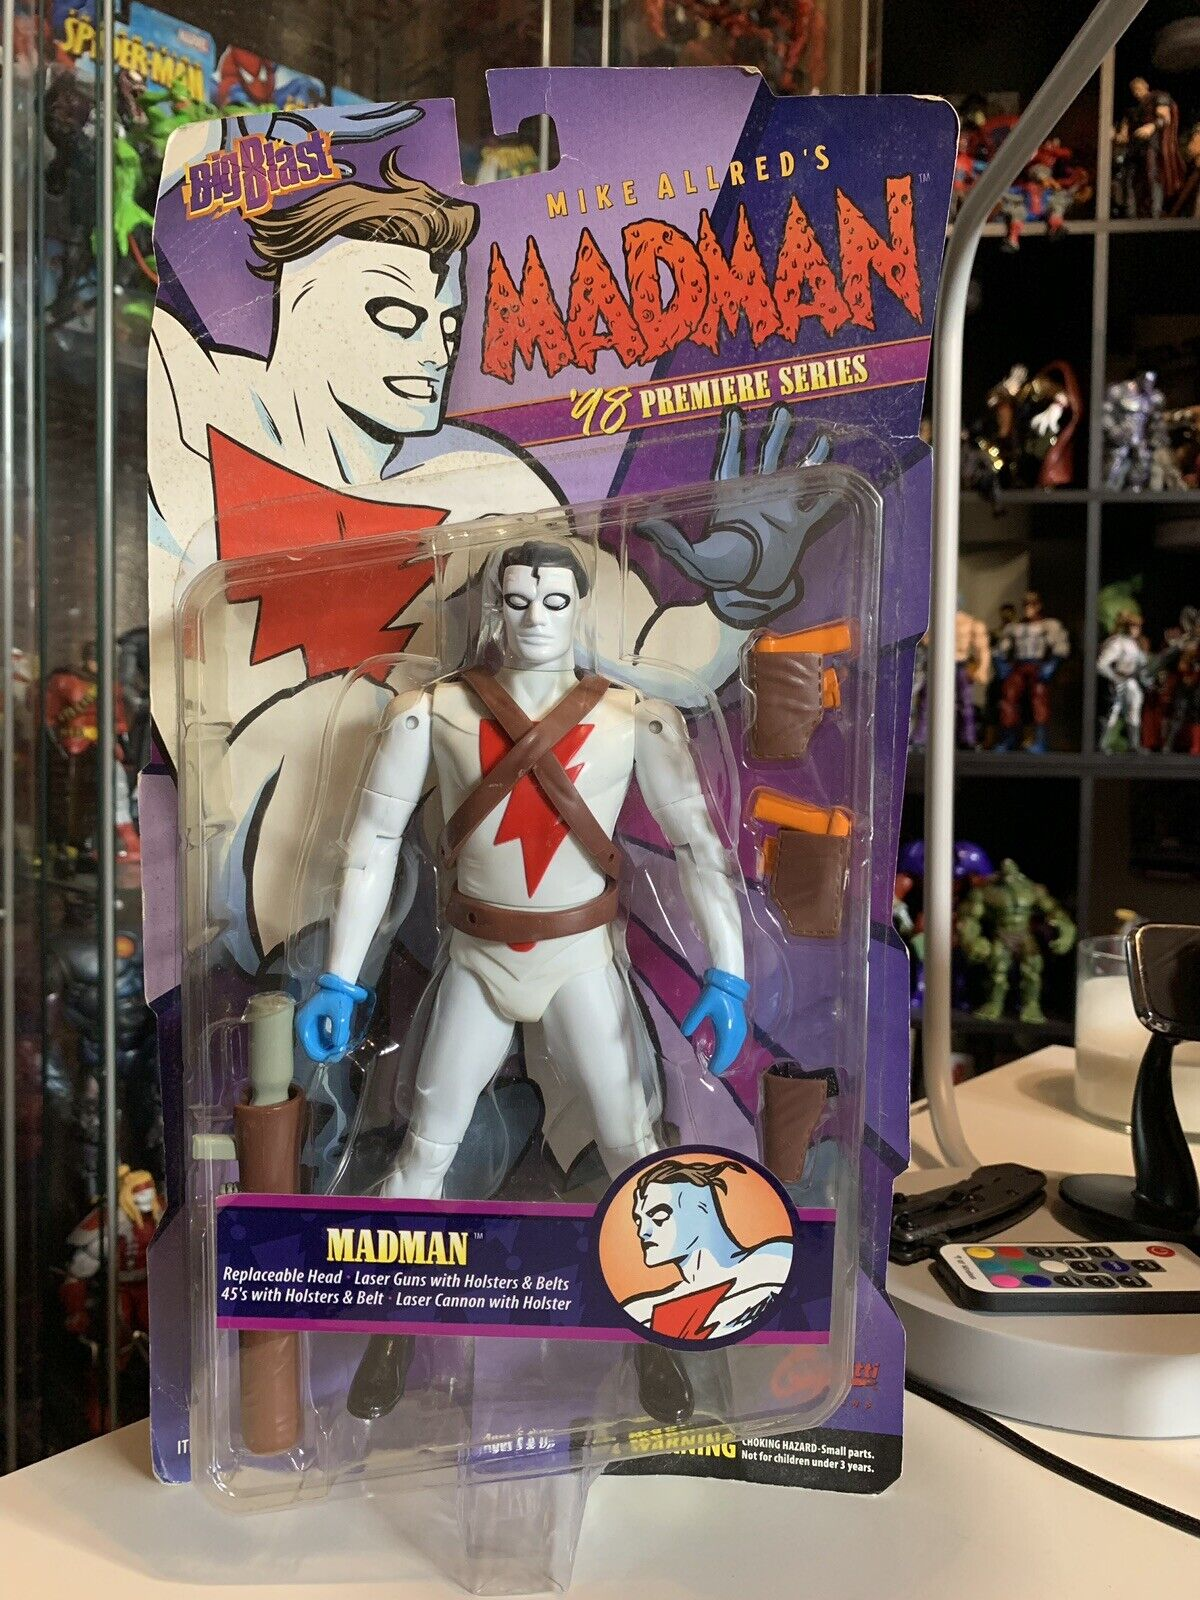 Madman x2 w accessory pk, pk, pk, Grendel, Mage Action Figure set -Graphitti-Big Blast 372fe7